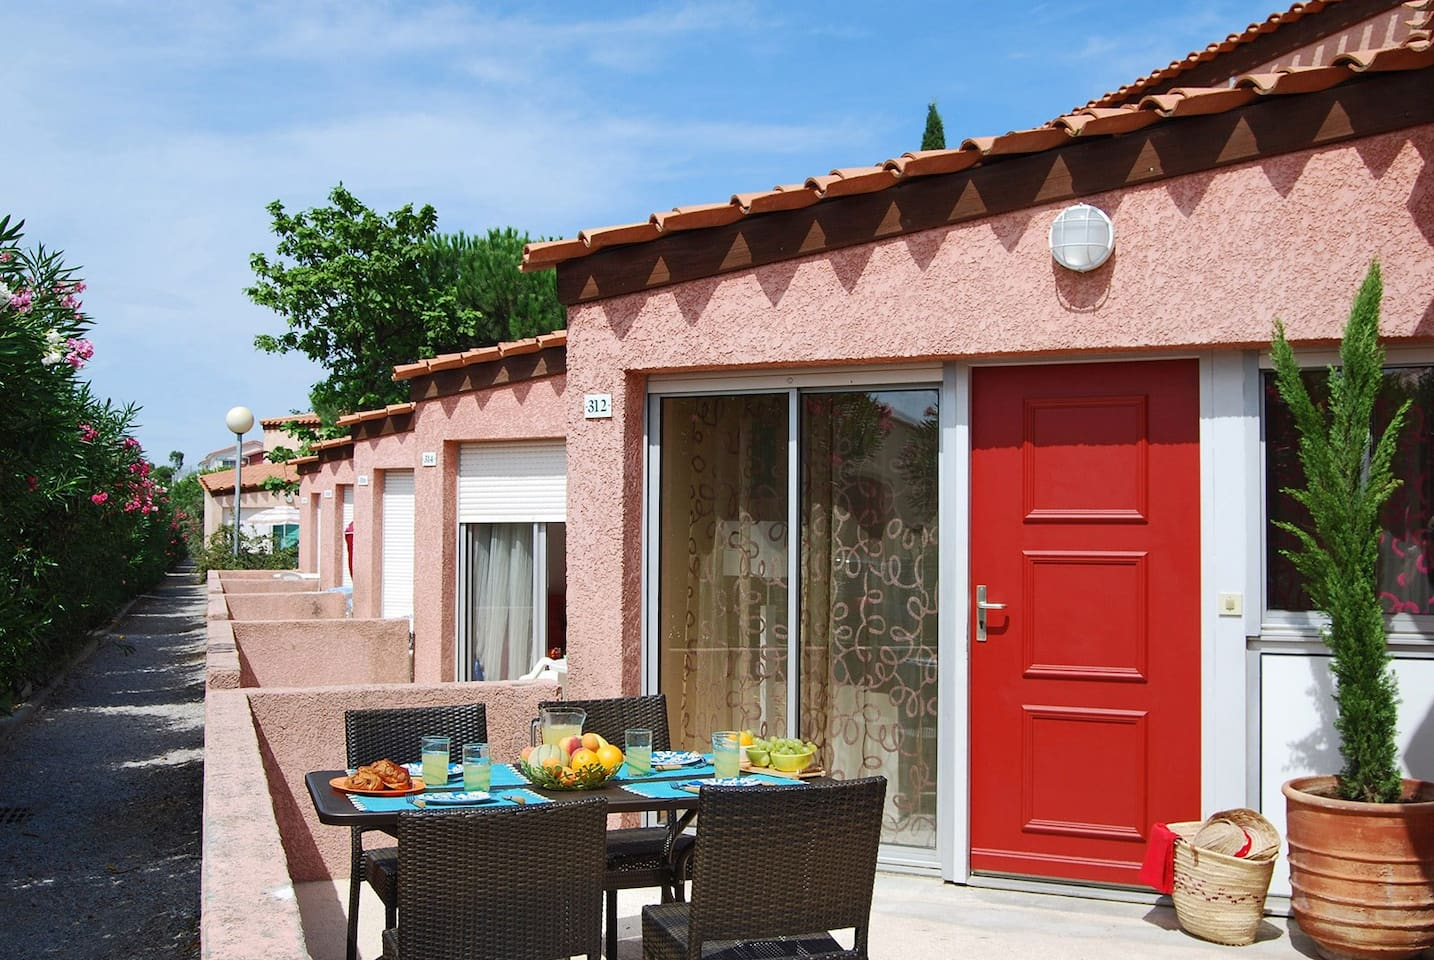 Enjoy the sunshine on your balcony or patio.